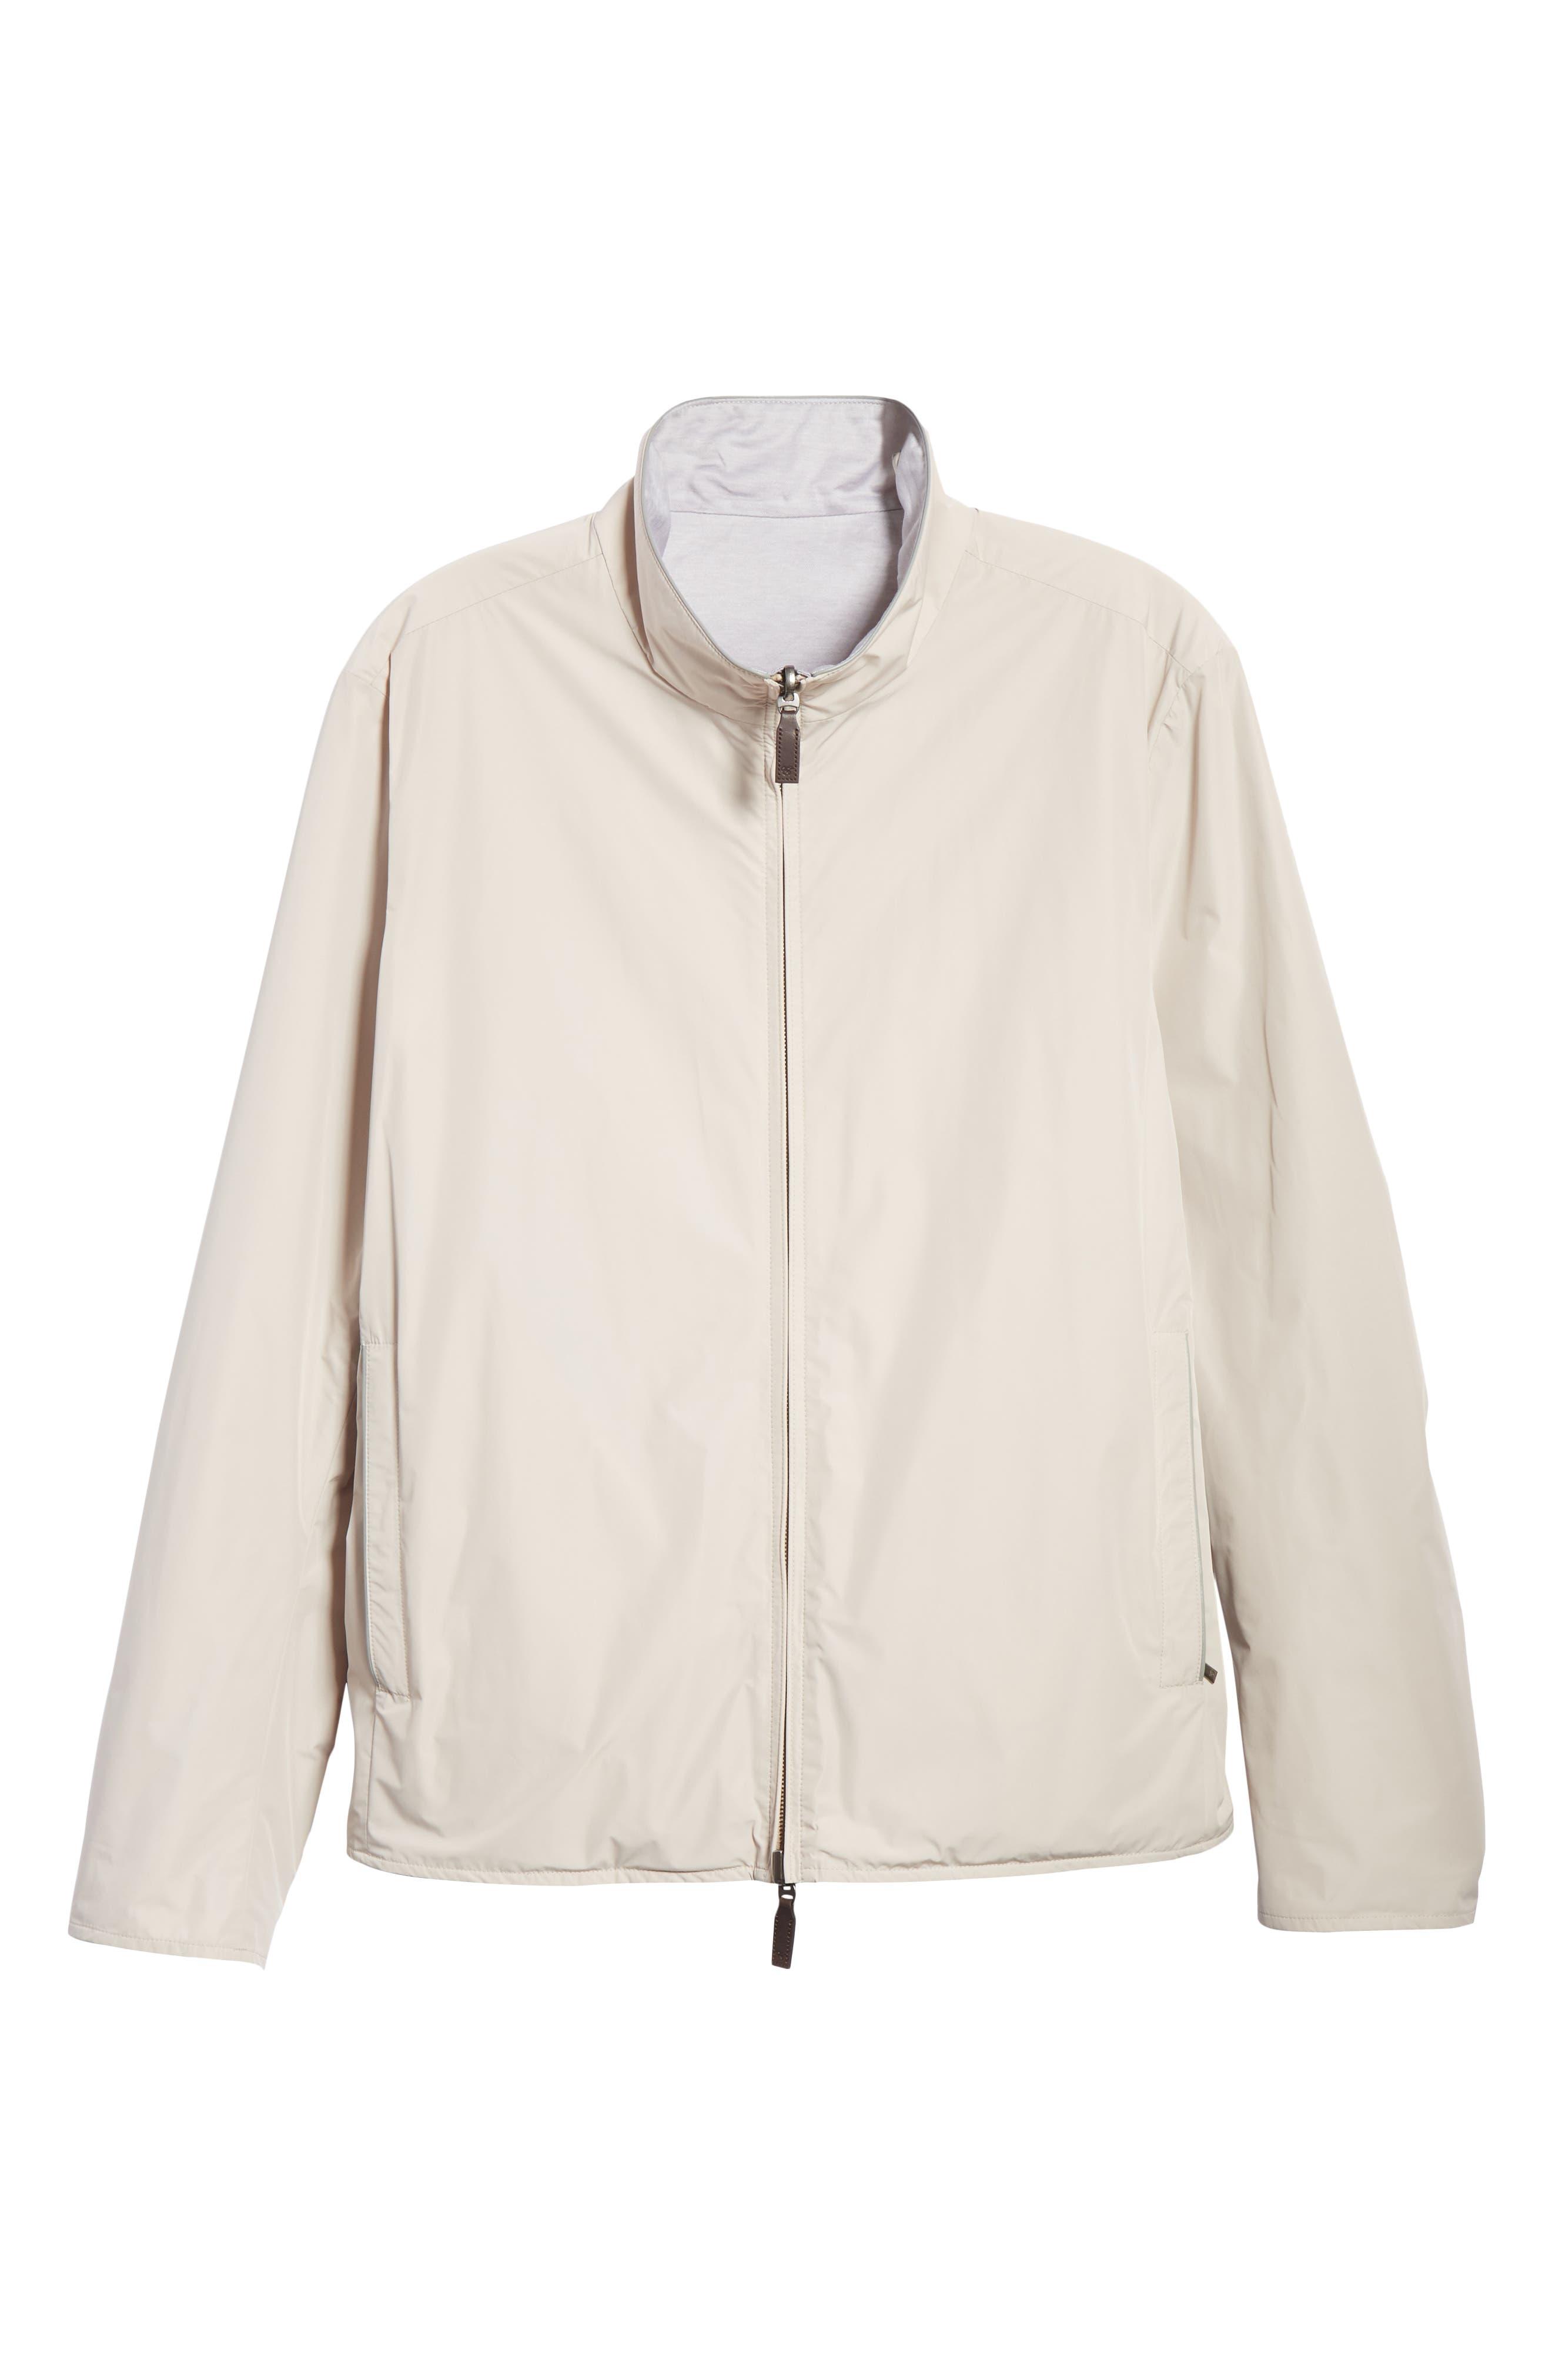 Regular Fit Cotton Jacket,                             Alternate thumbnail 5, color,